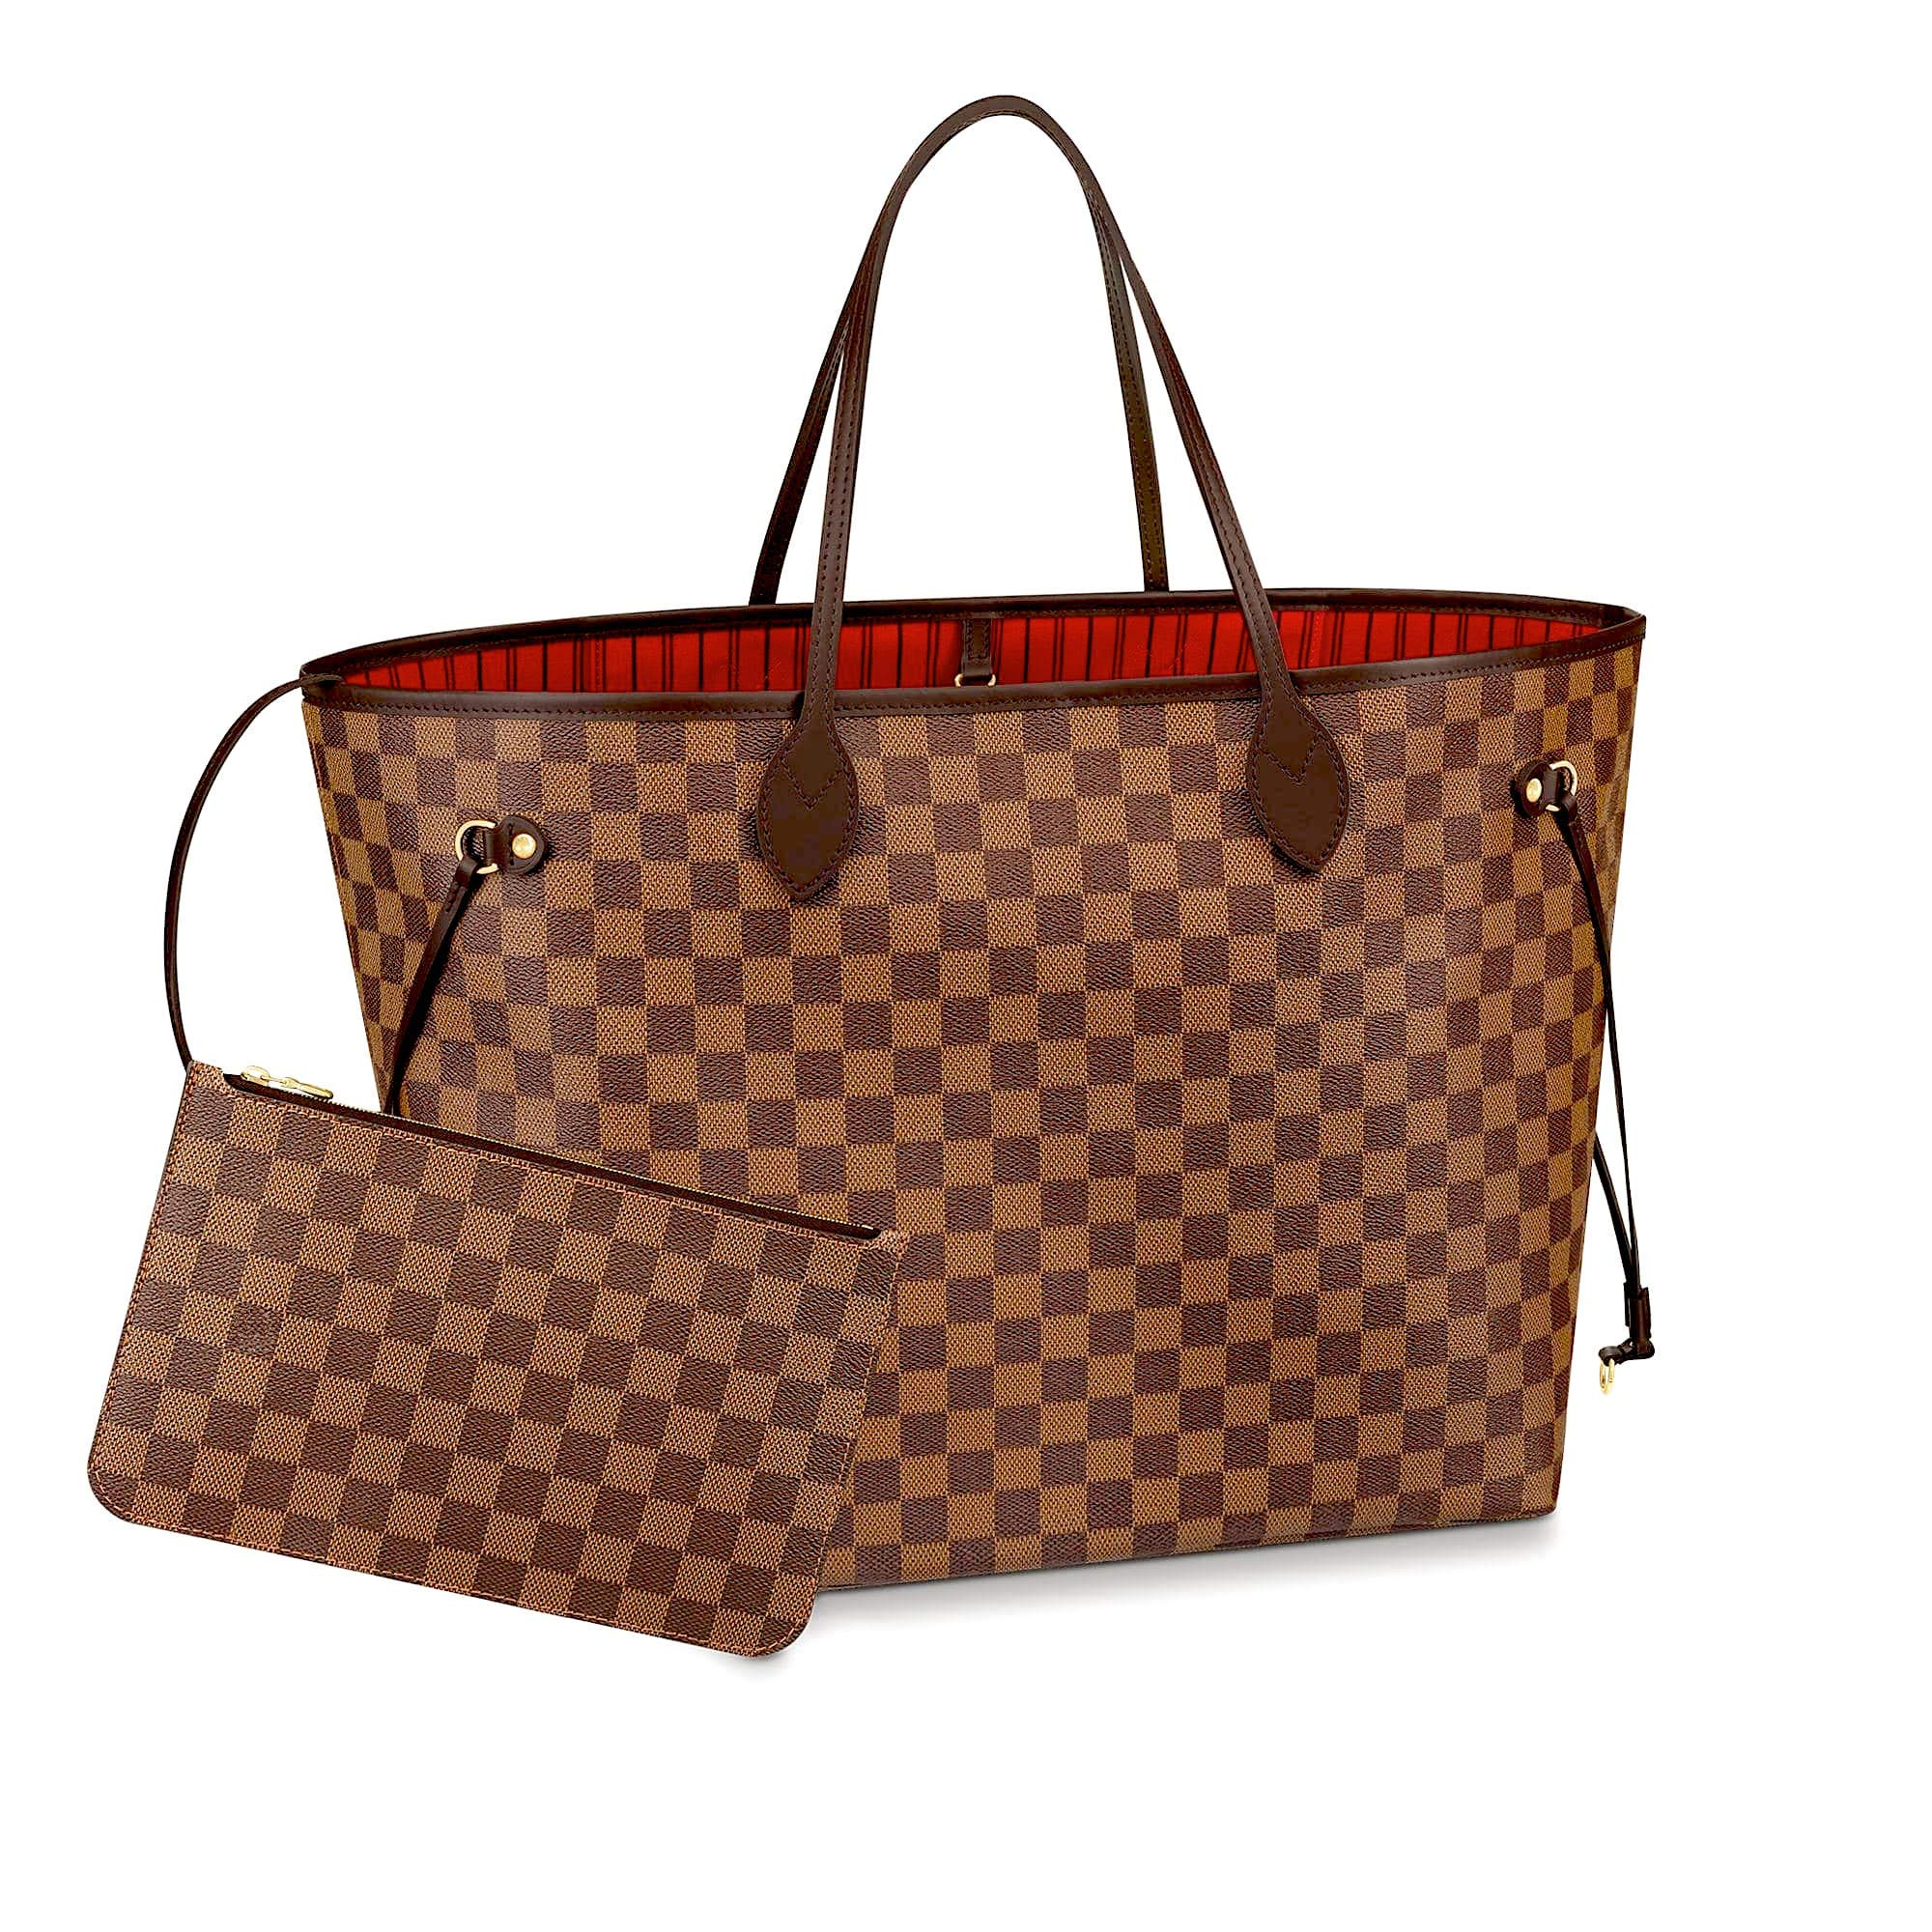 BELIKSTORE Ladies Shopper Checkered Handbag Neverfull Style Canvas Tote Bag for Women Top Handle Ladies Girls Shoulder Bag Water Resistant Lightweight Fashion Satchel Purse by ROMAN BELIKOV